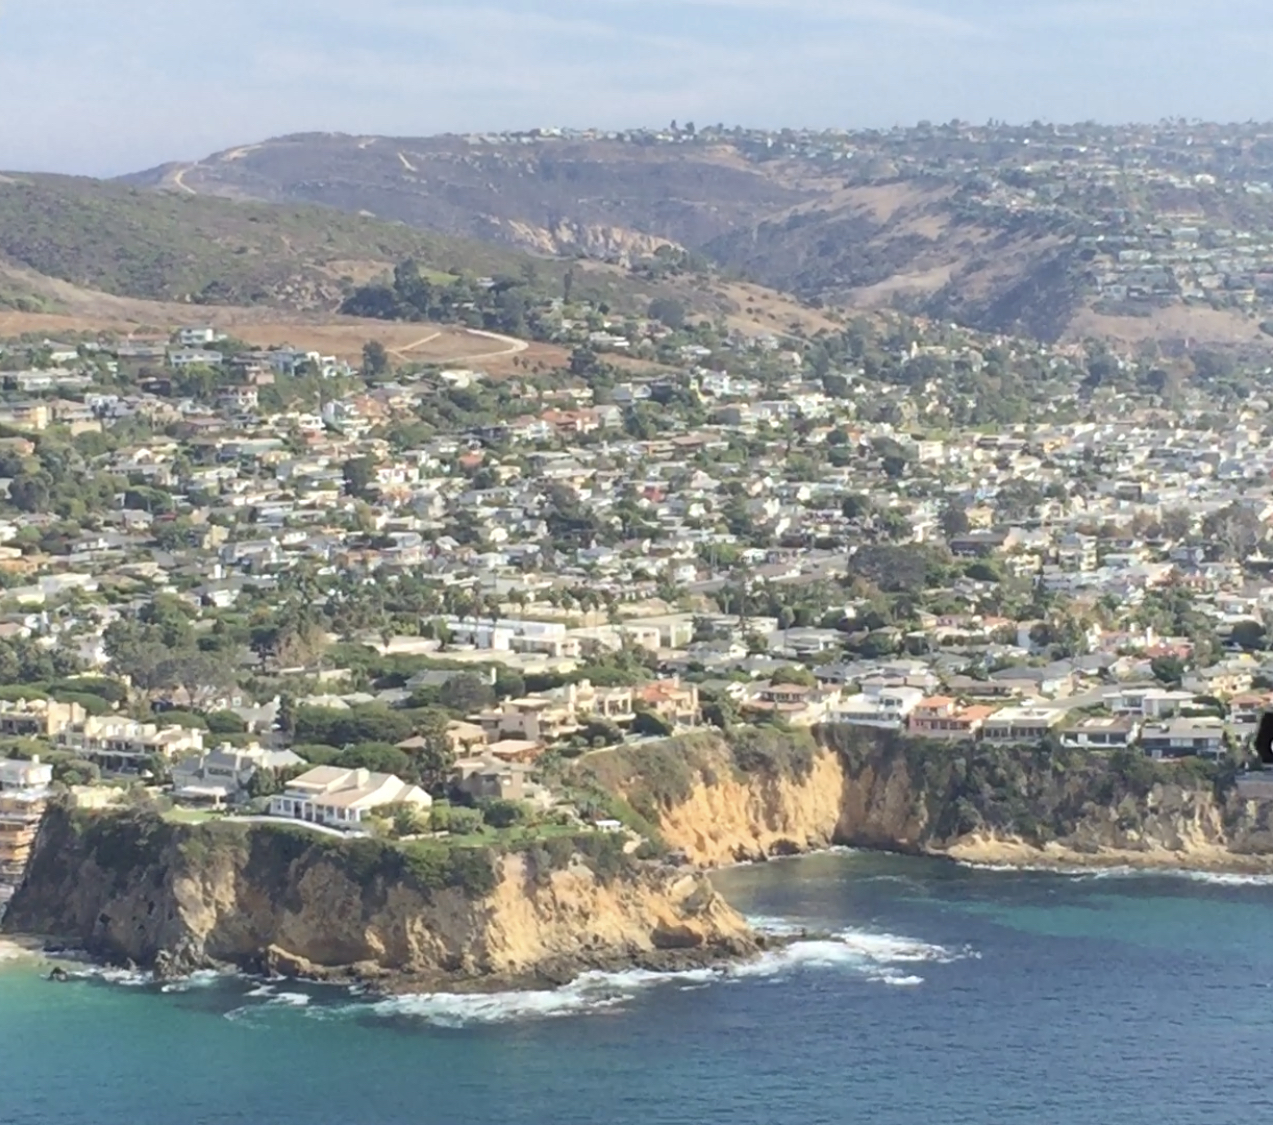 Laguna Beach wades into housing plan ahead of state deadline